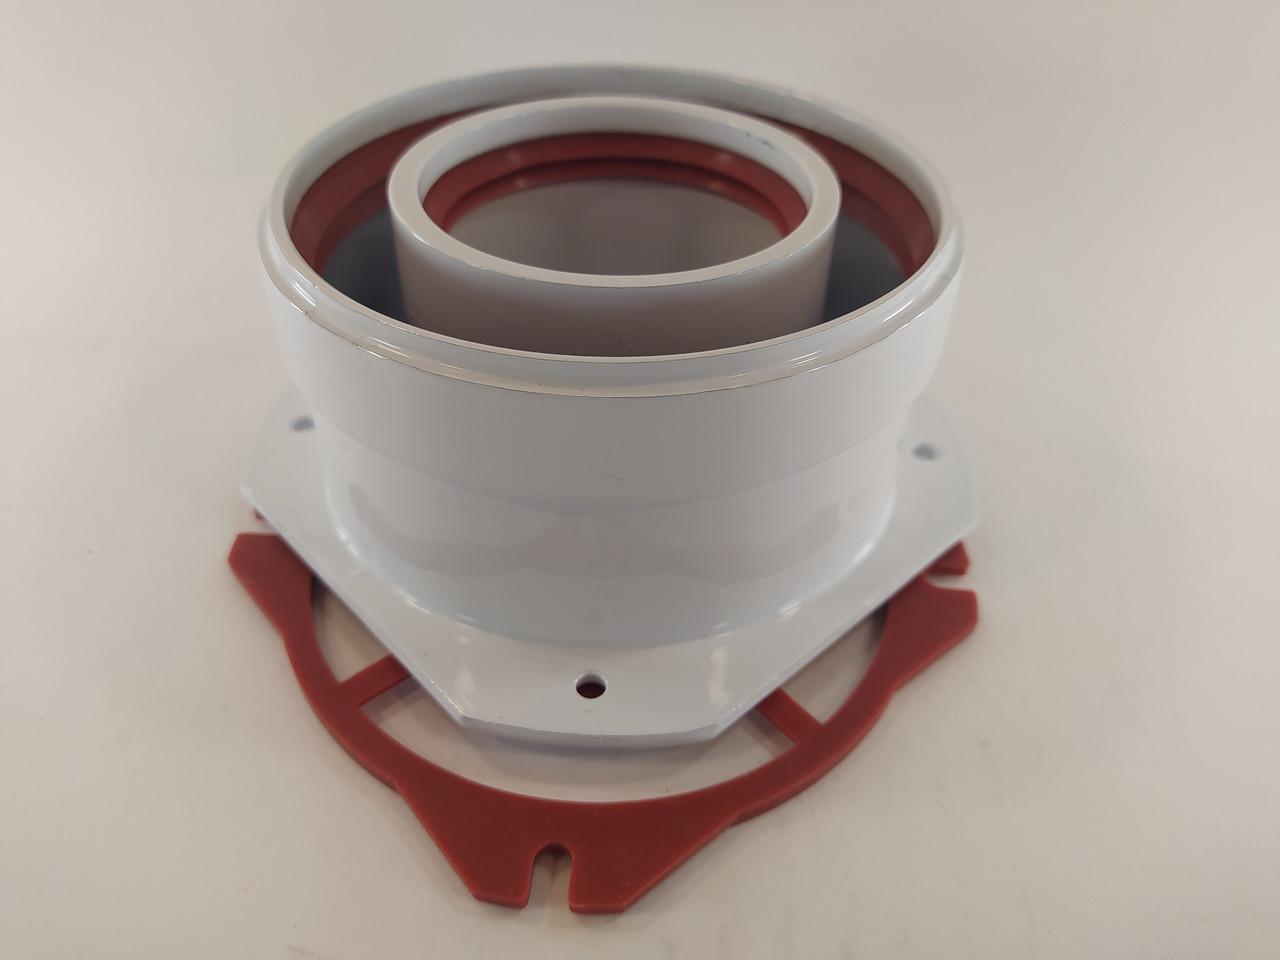 Адаптер 60/100 Immergas вертикальный фланцевый